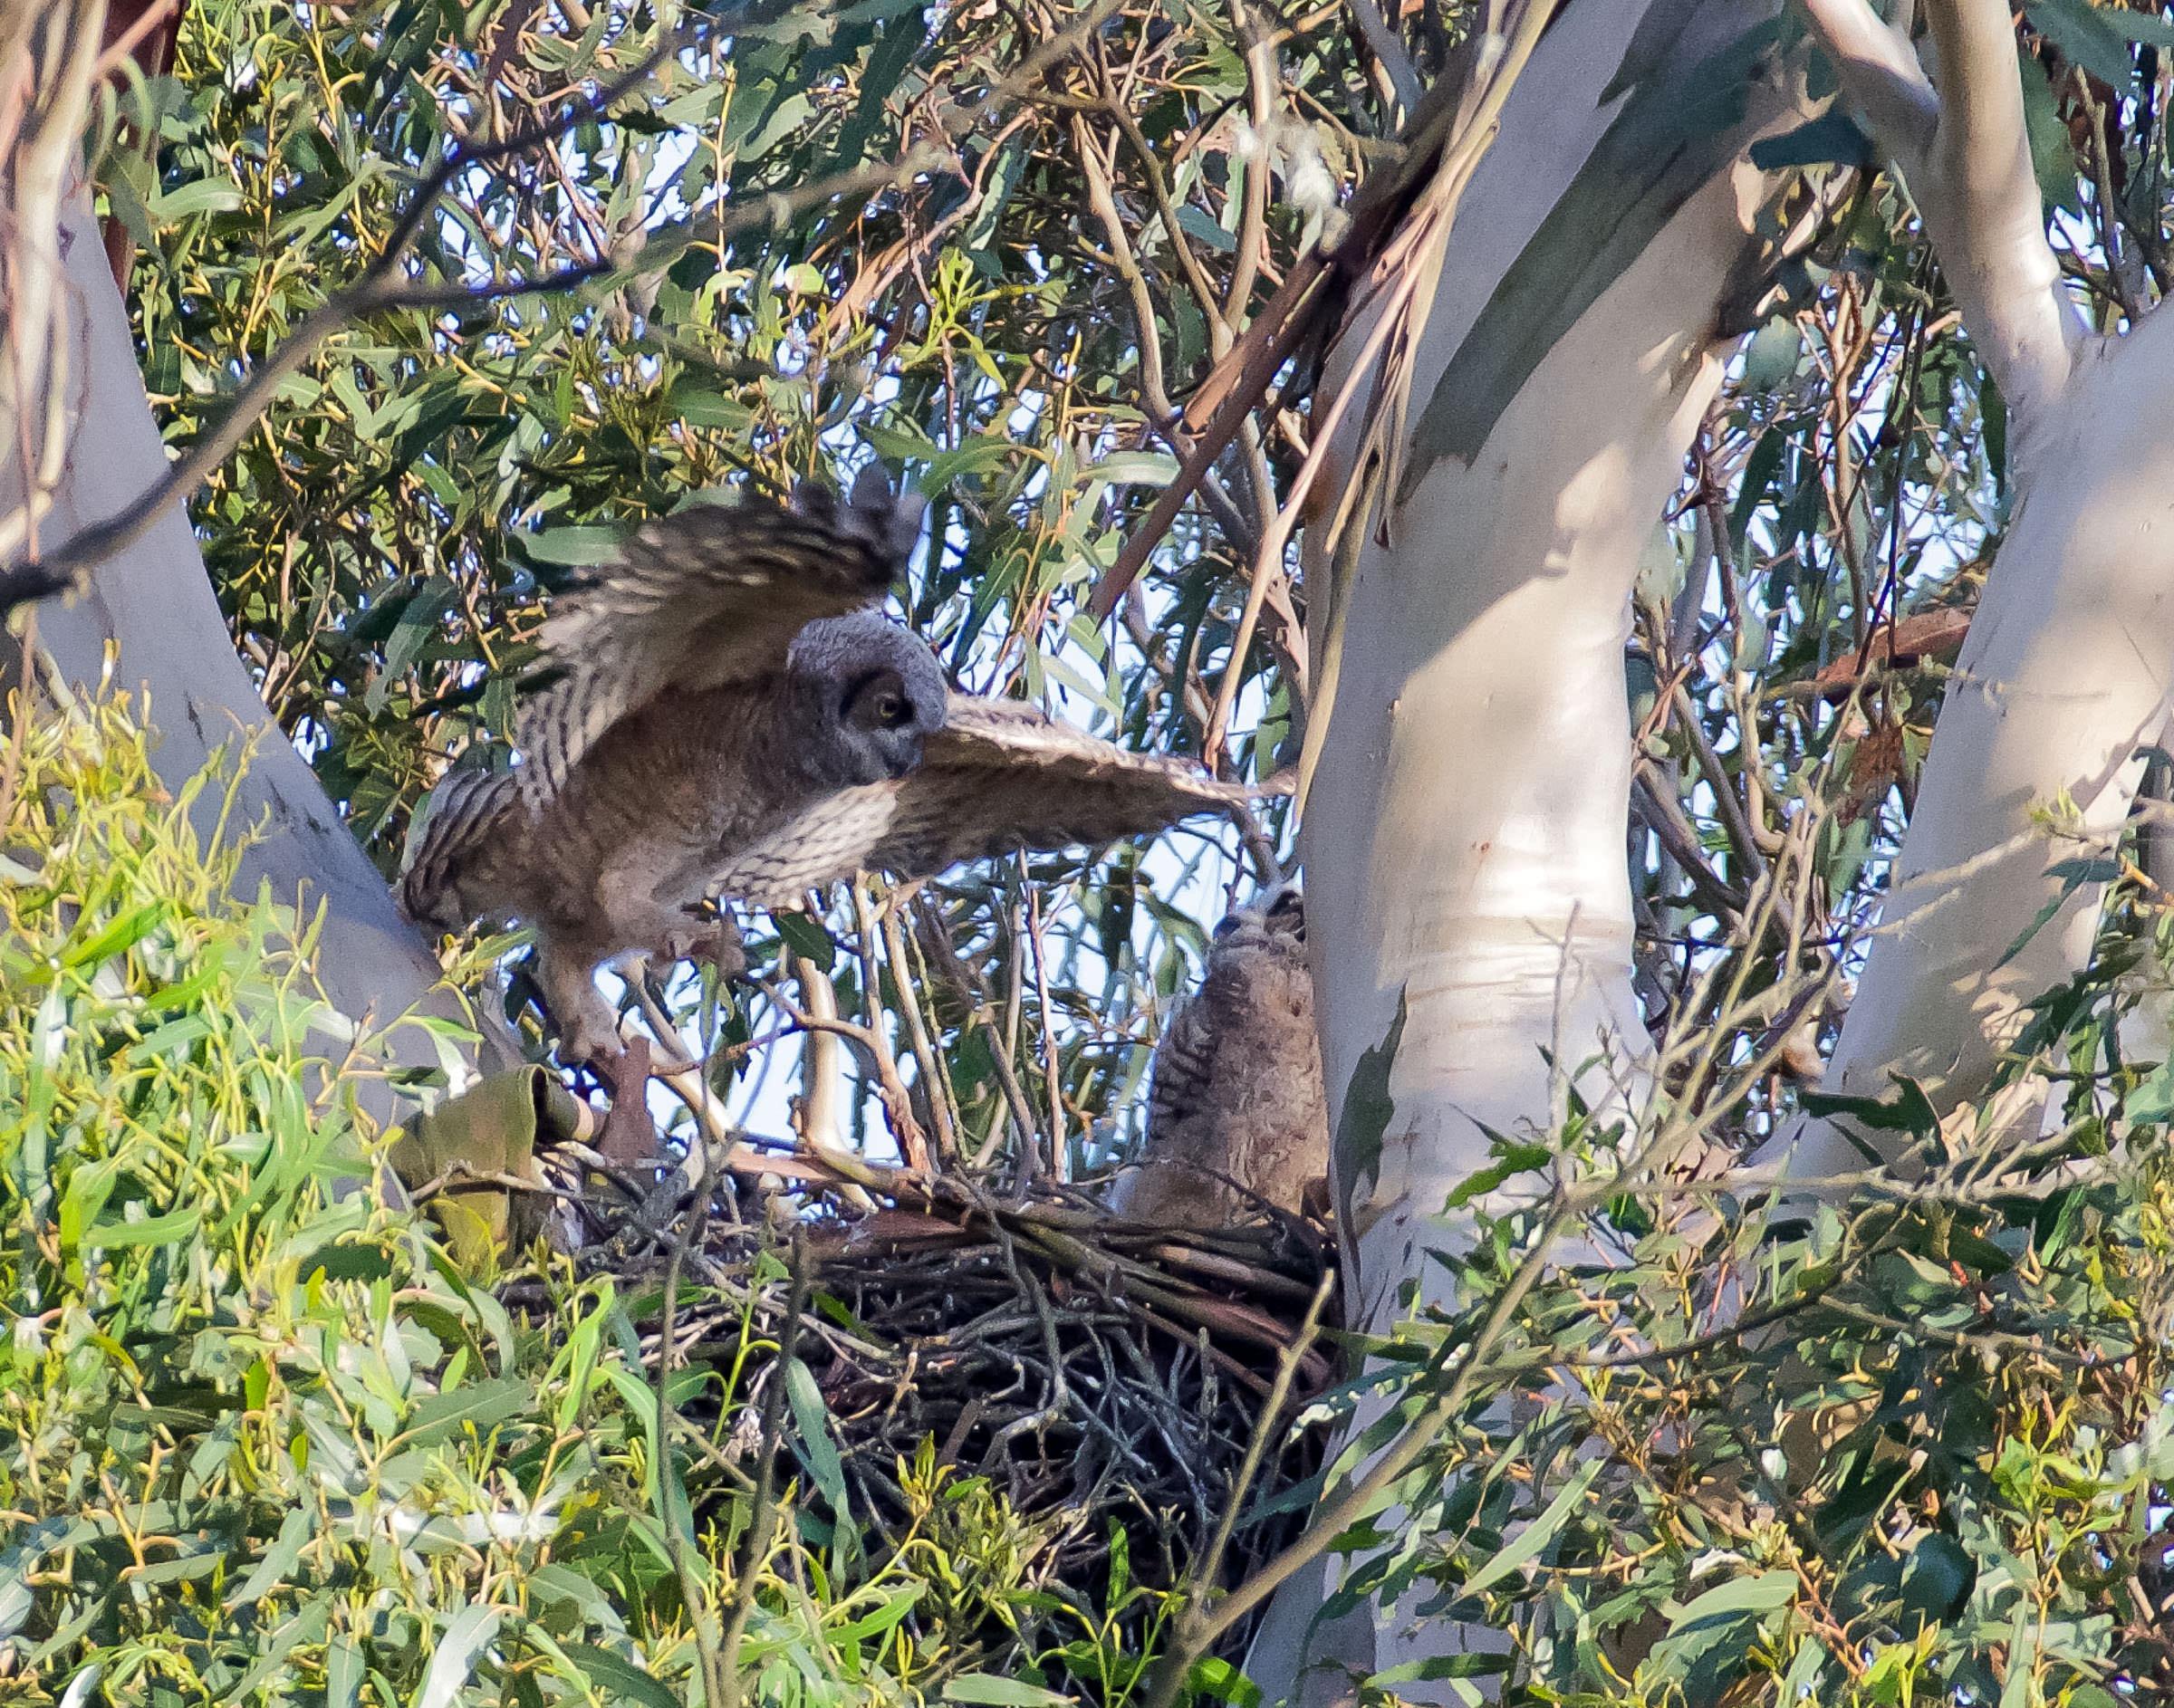 great_horned_owlets_fly_nest_book3-3.jpg